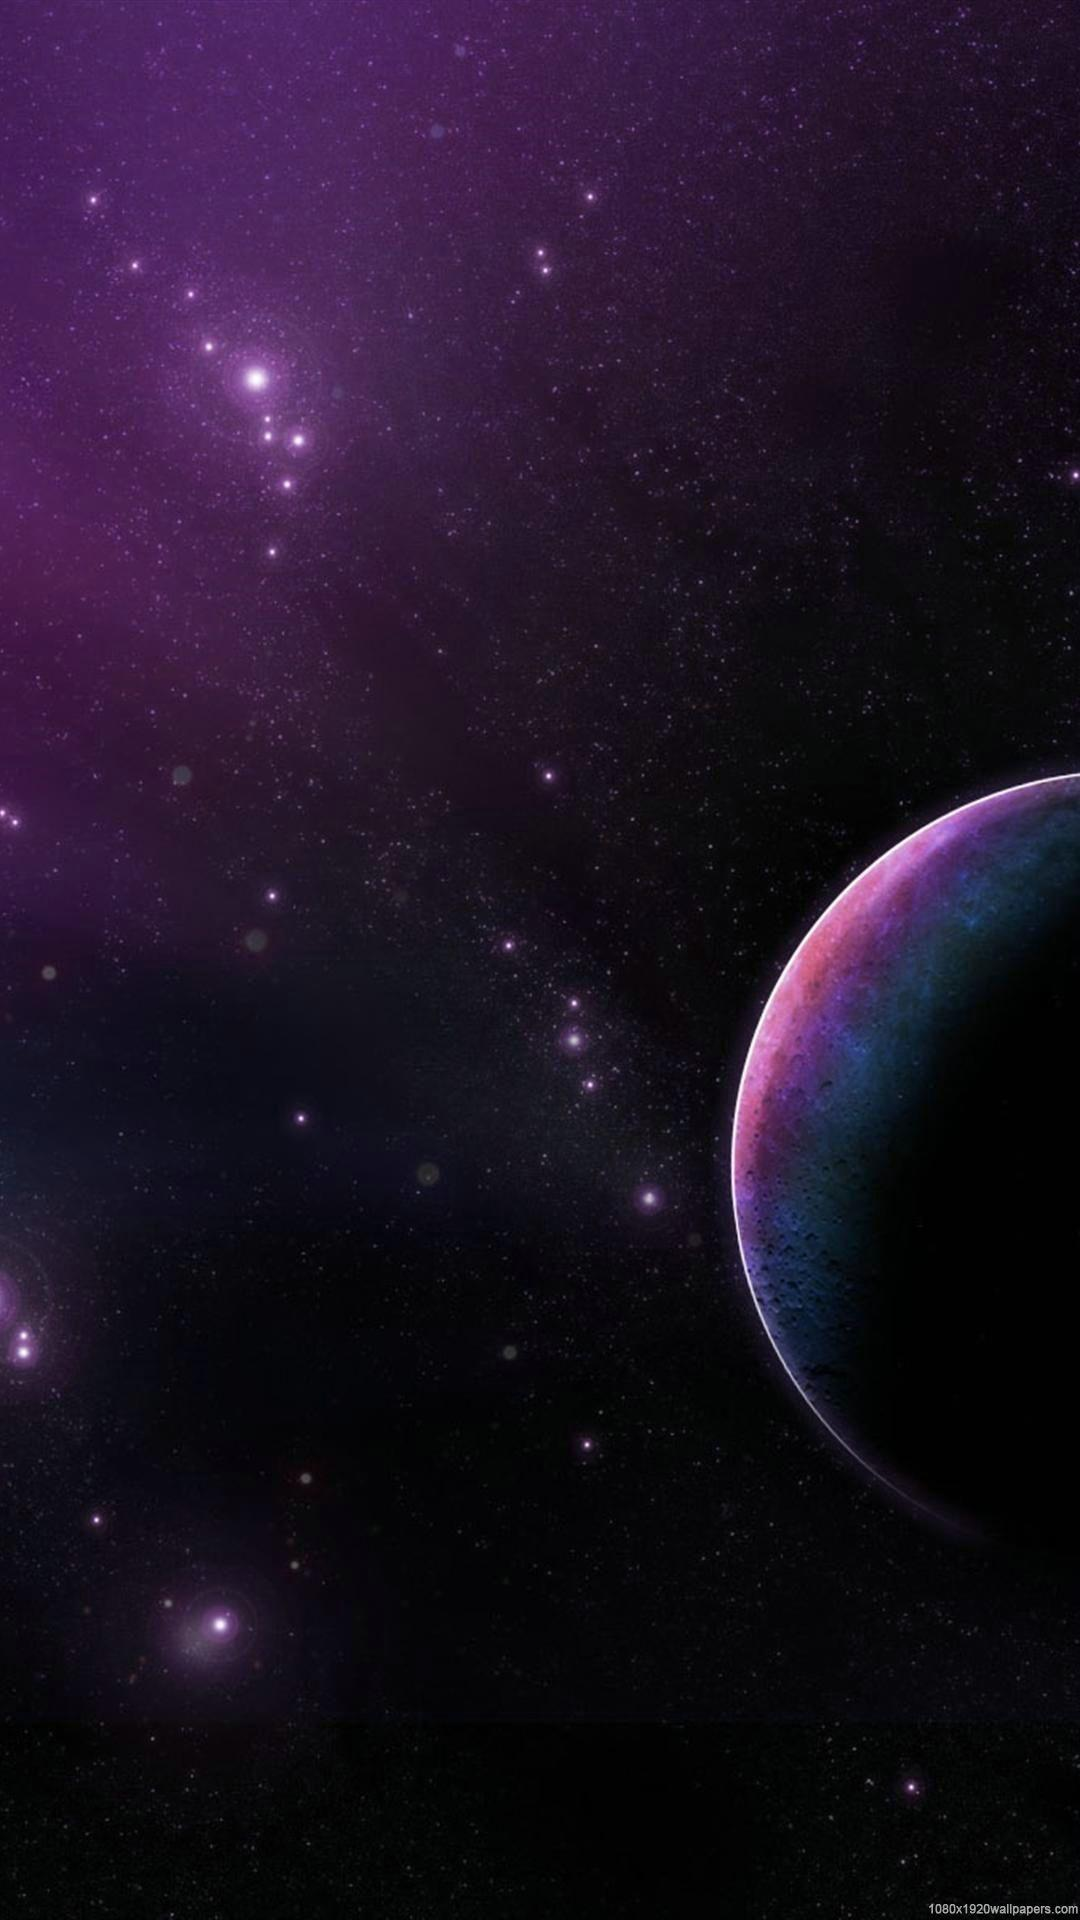 16516 Space Wallpaper Hd Vertical